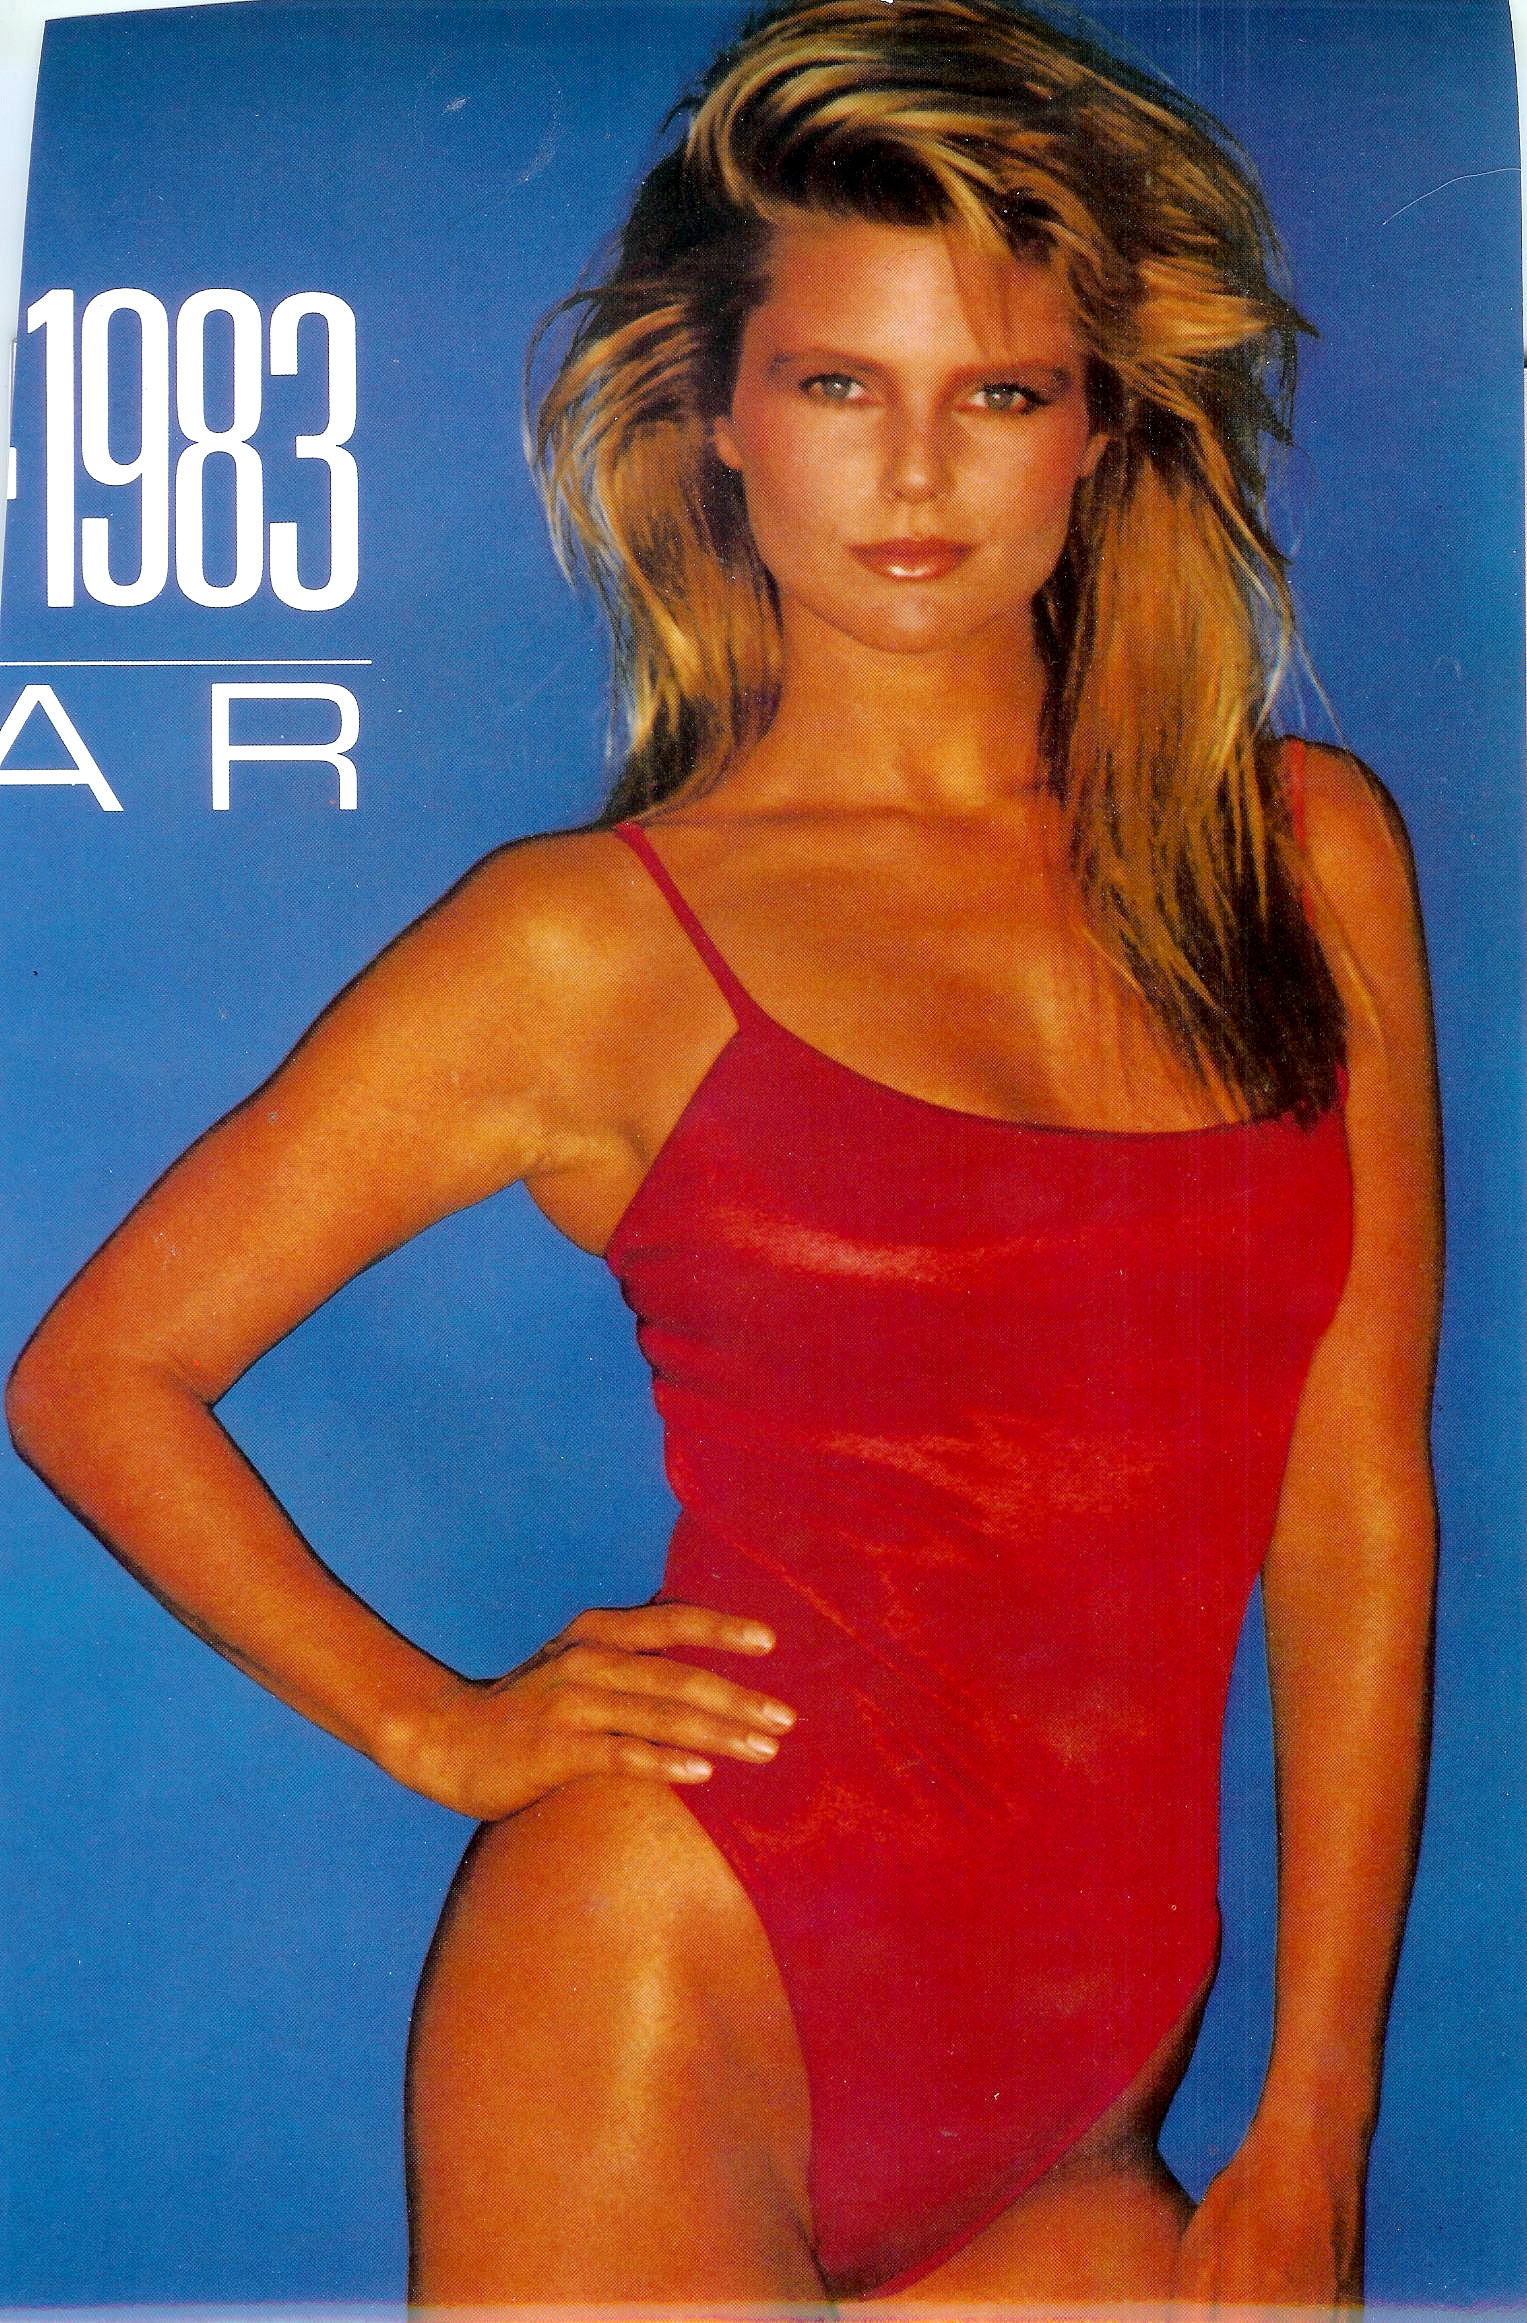 1993 calendar